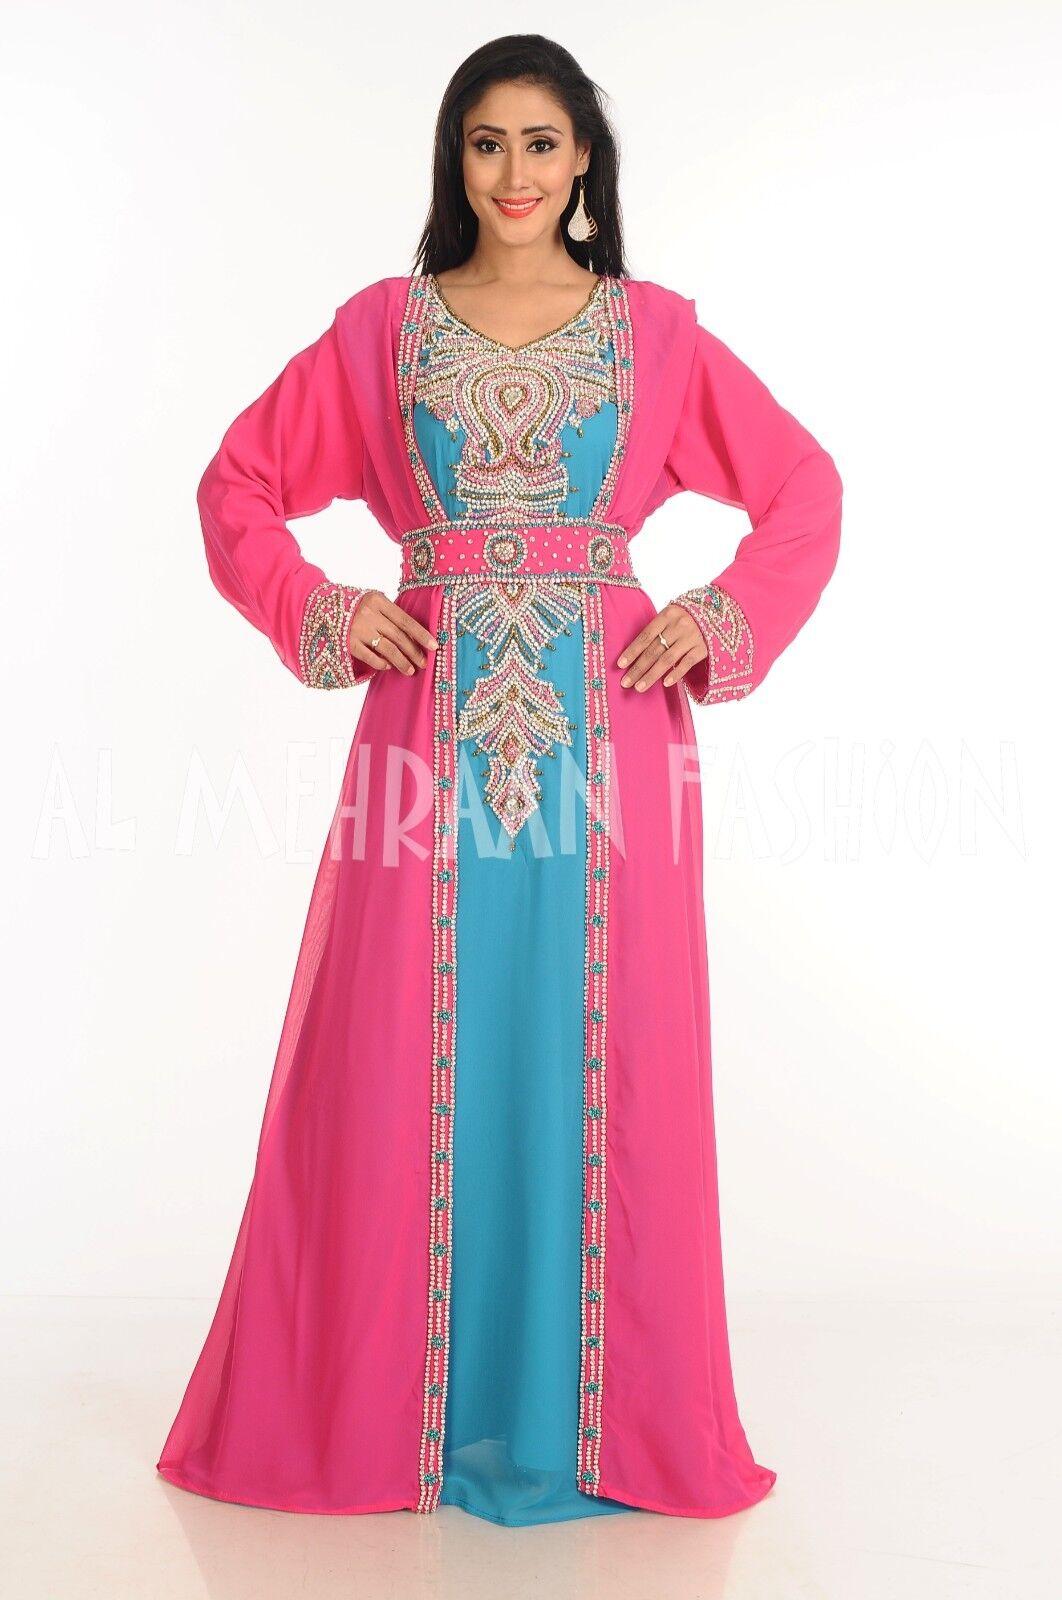 ELEGANT ELEGANT ELEGANT MgoldCCAN FANCY JILBAB ARABIAN DUBAI TAKSHITA WEDDING GOWN DRESS  150 61c8b8